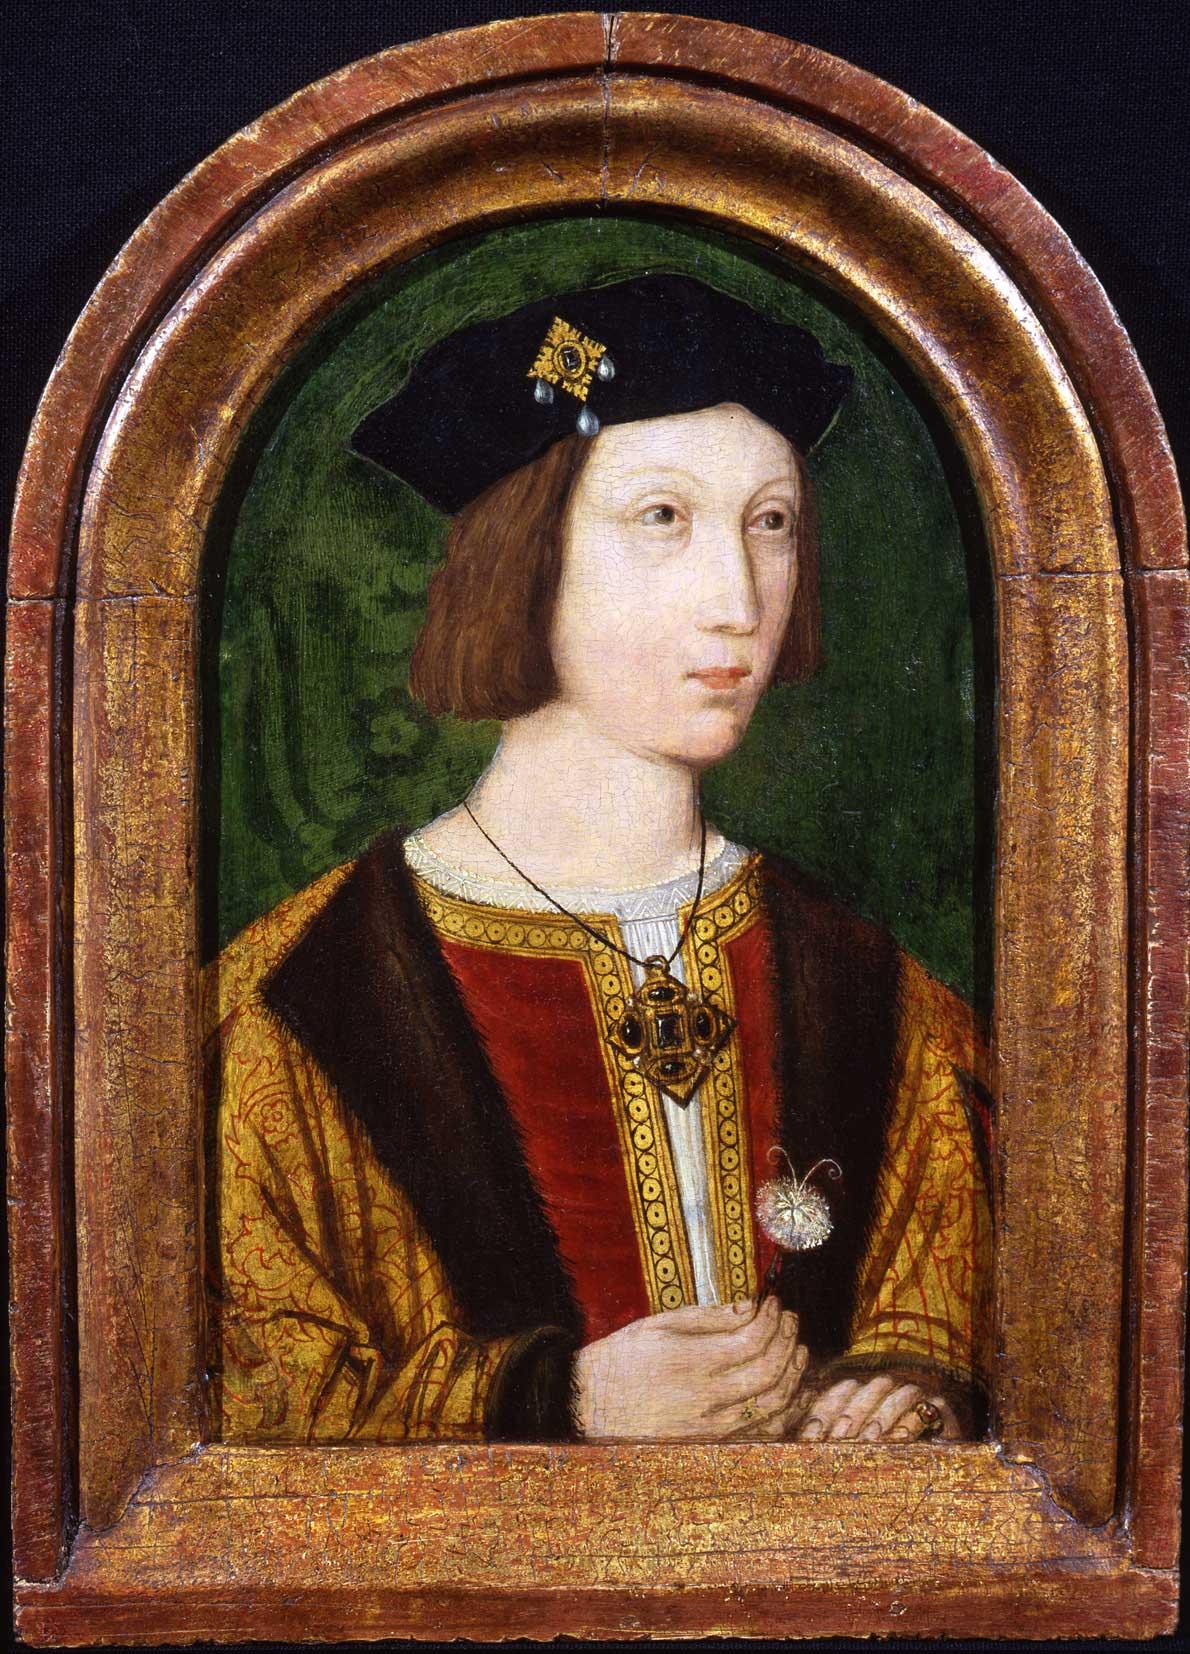 a portrait of a young Tudor man with a felt hat and brocaded coat